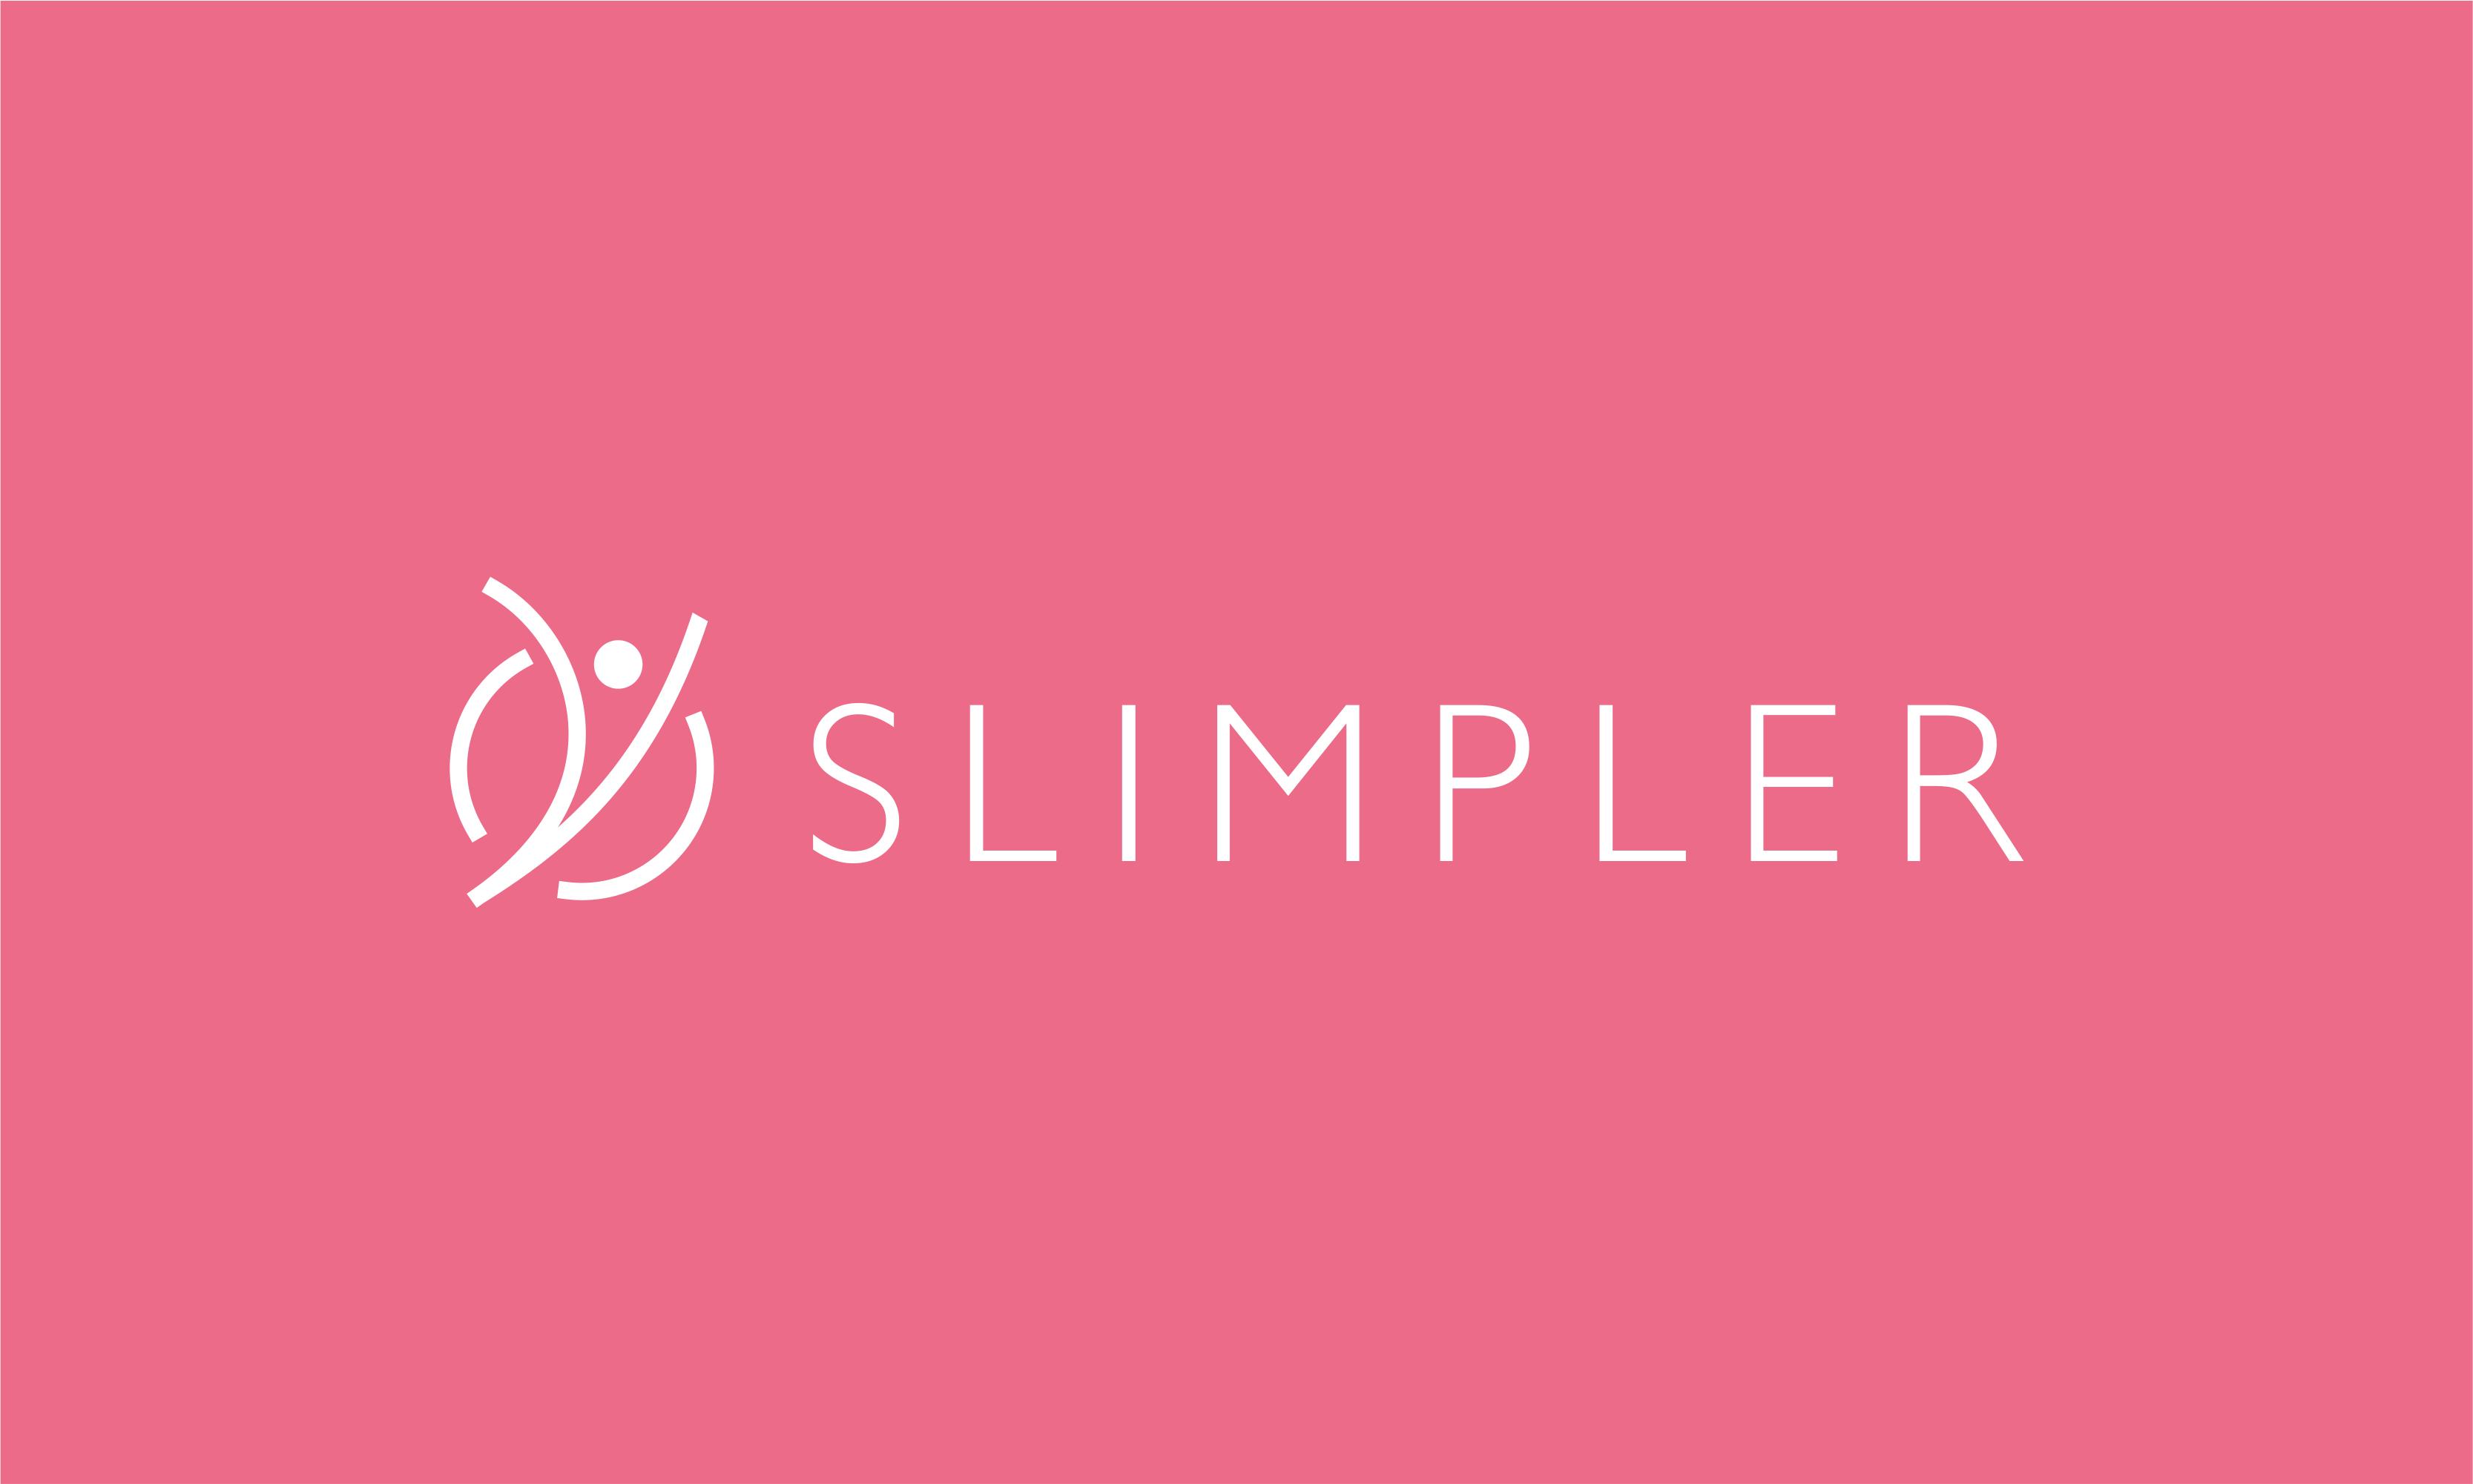 Slimpler - Fitness domain name for sale